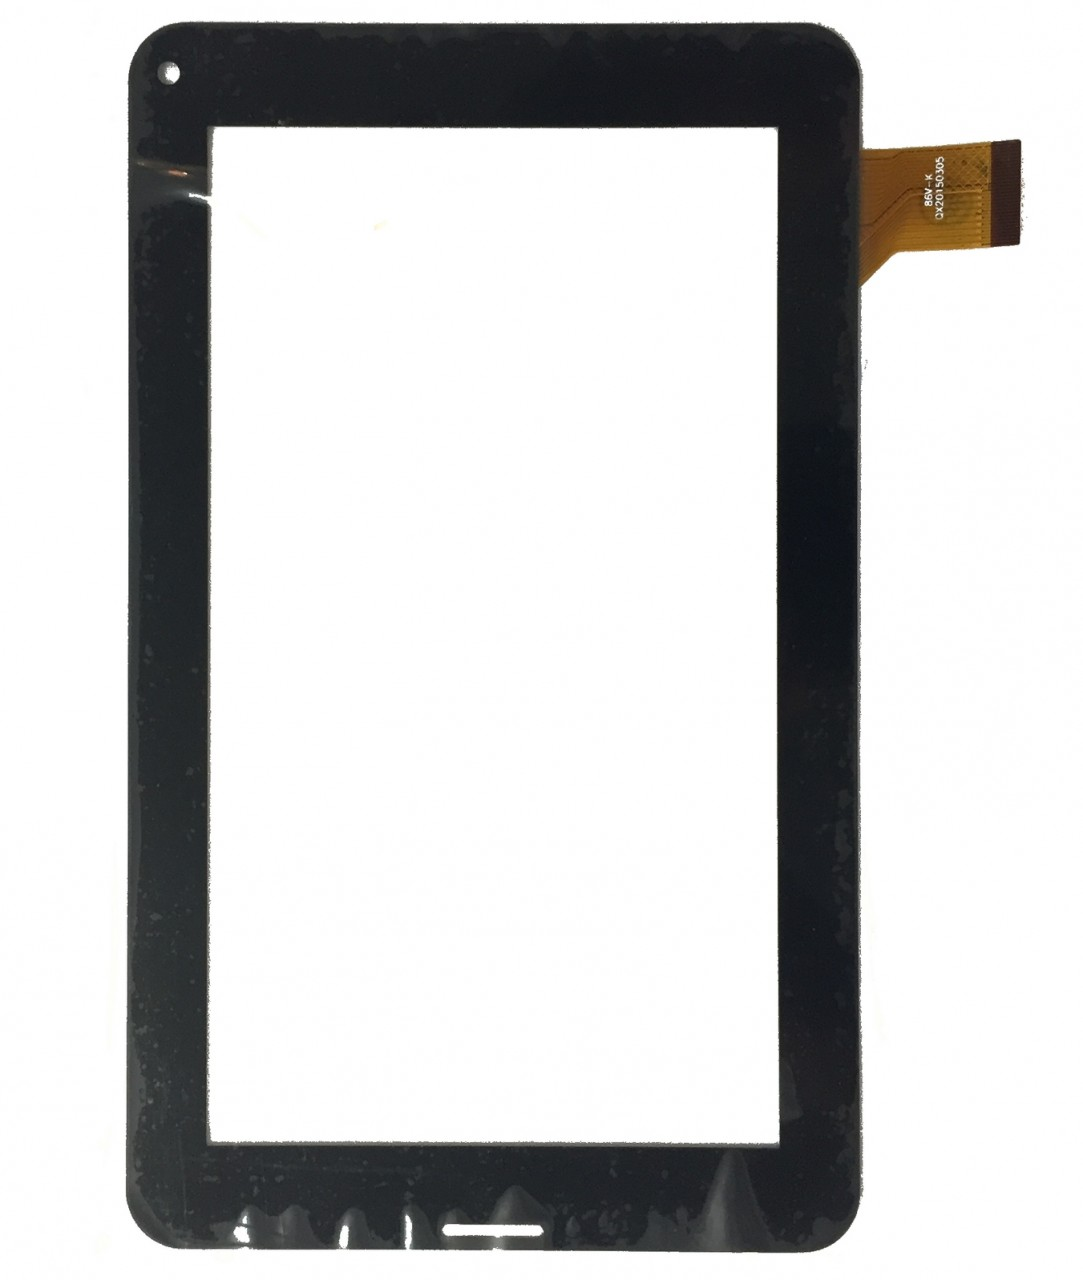 Touchscreen Digitizer Quer KOM0701 cu speaker hole Geam Sticla Tableta imagine powerlaptop.ro 2021